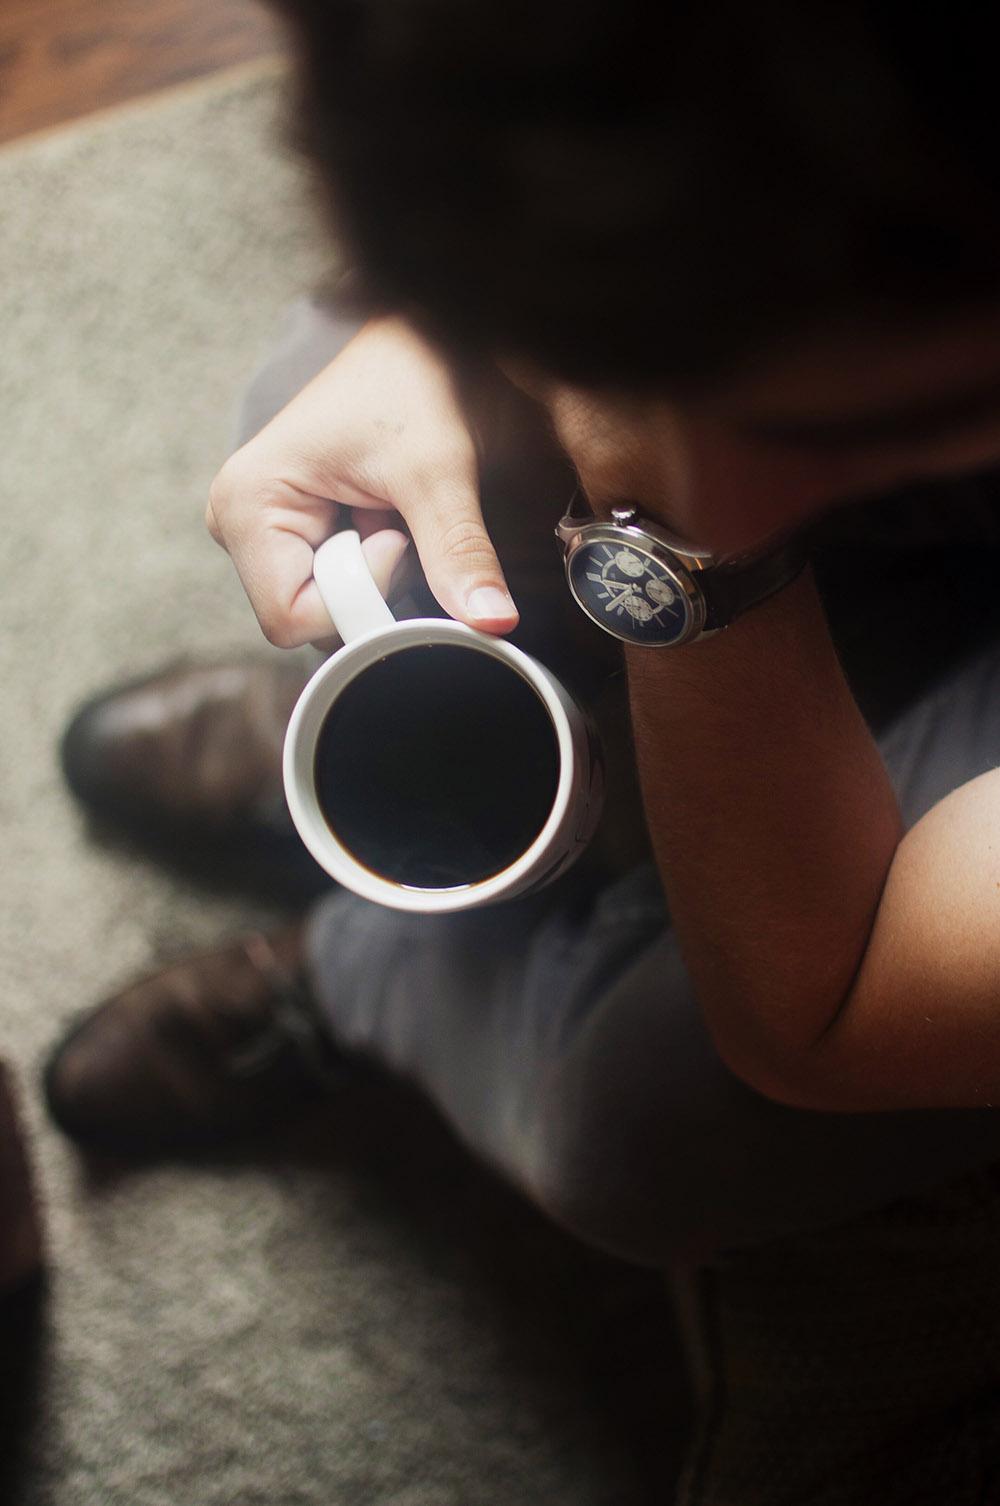 urban-nutters-blog-nigelng-coffee-worry